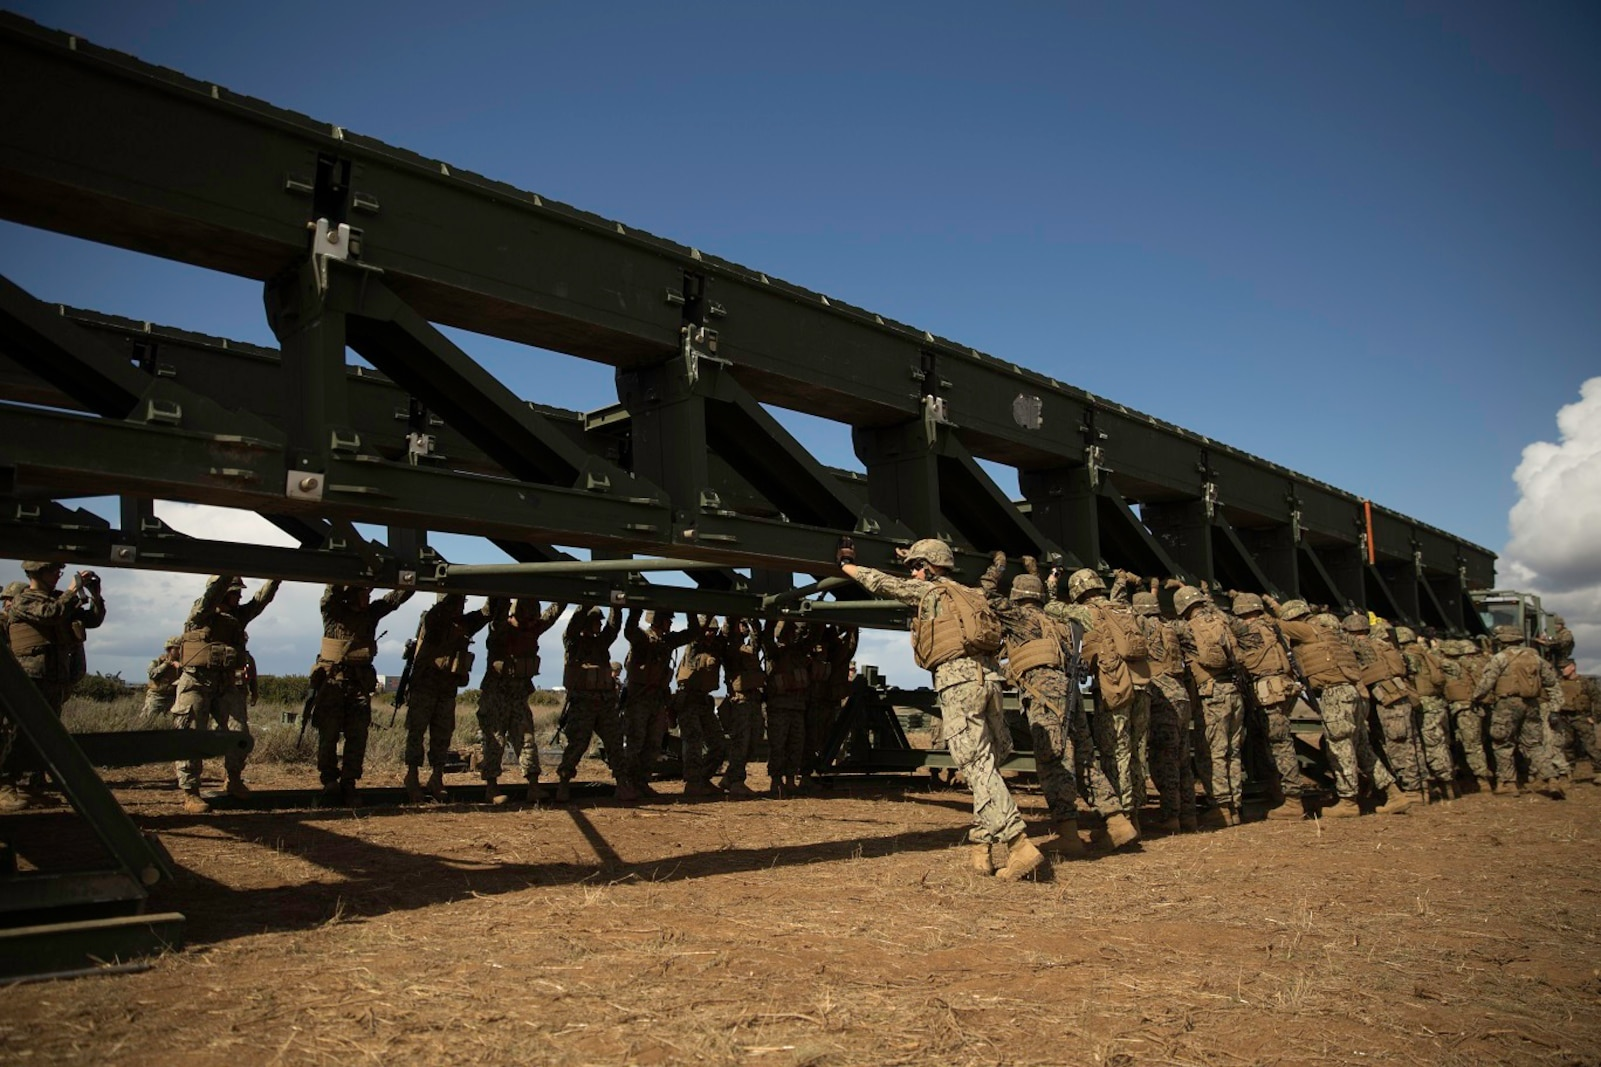 Bridge Company Field Training Exercise